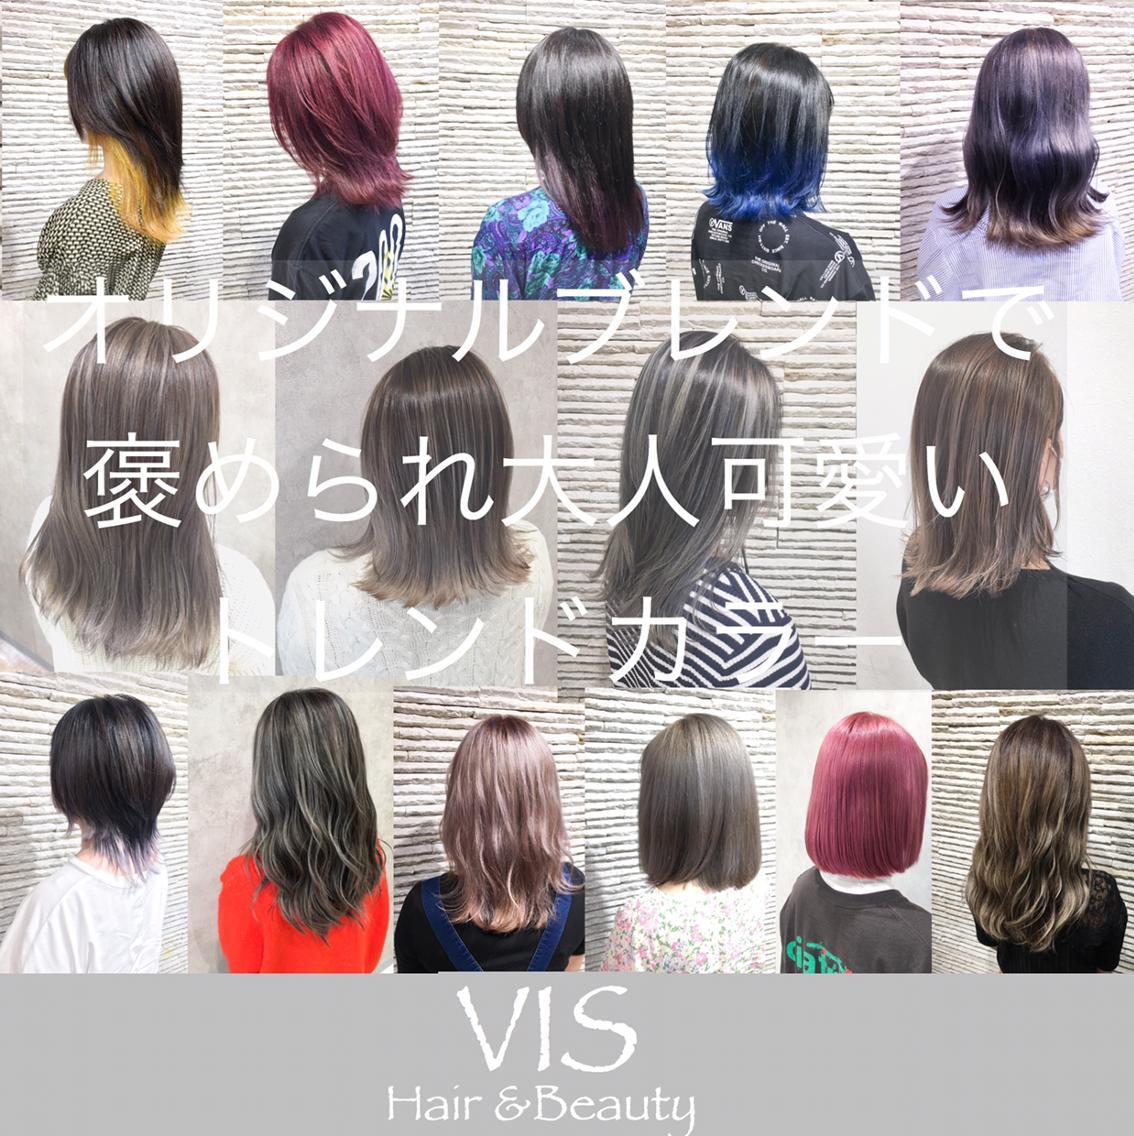 Vis lien 川口店所属・【川口】カラーは ヤマサキへ🍀の掲載